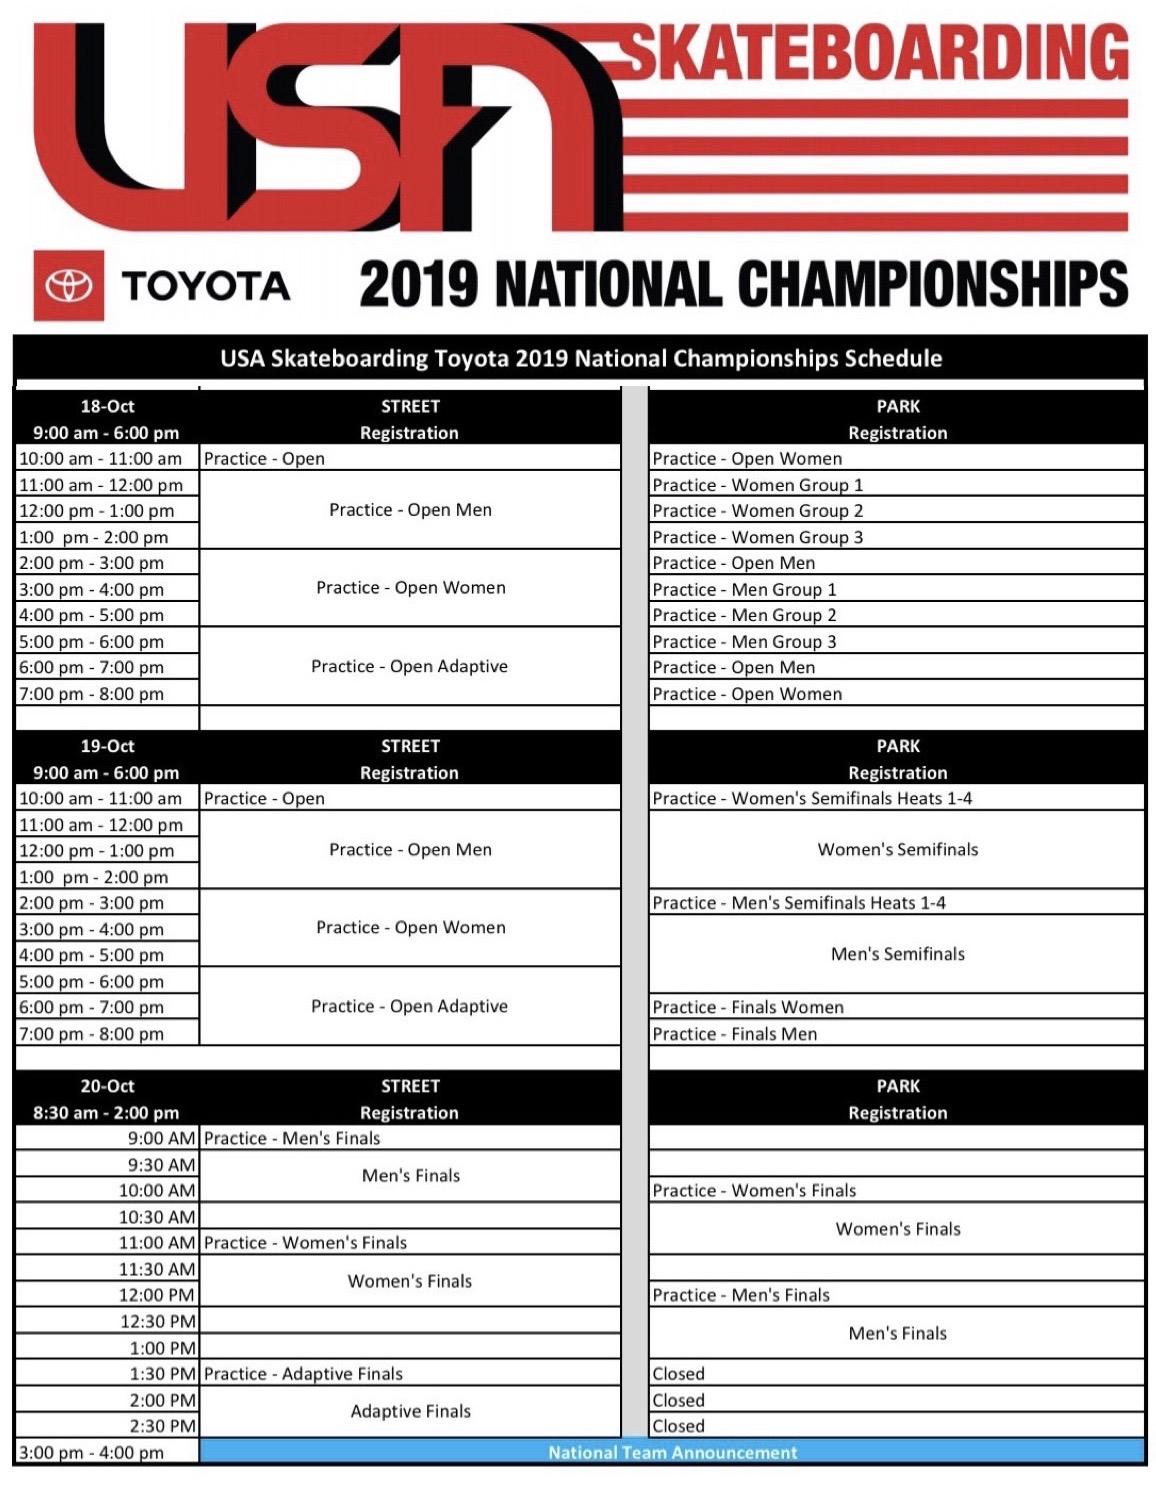 usa-skateboarding-national-championships-schedule